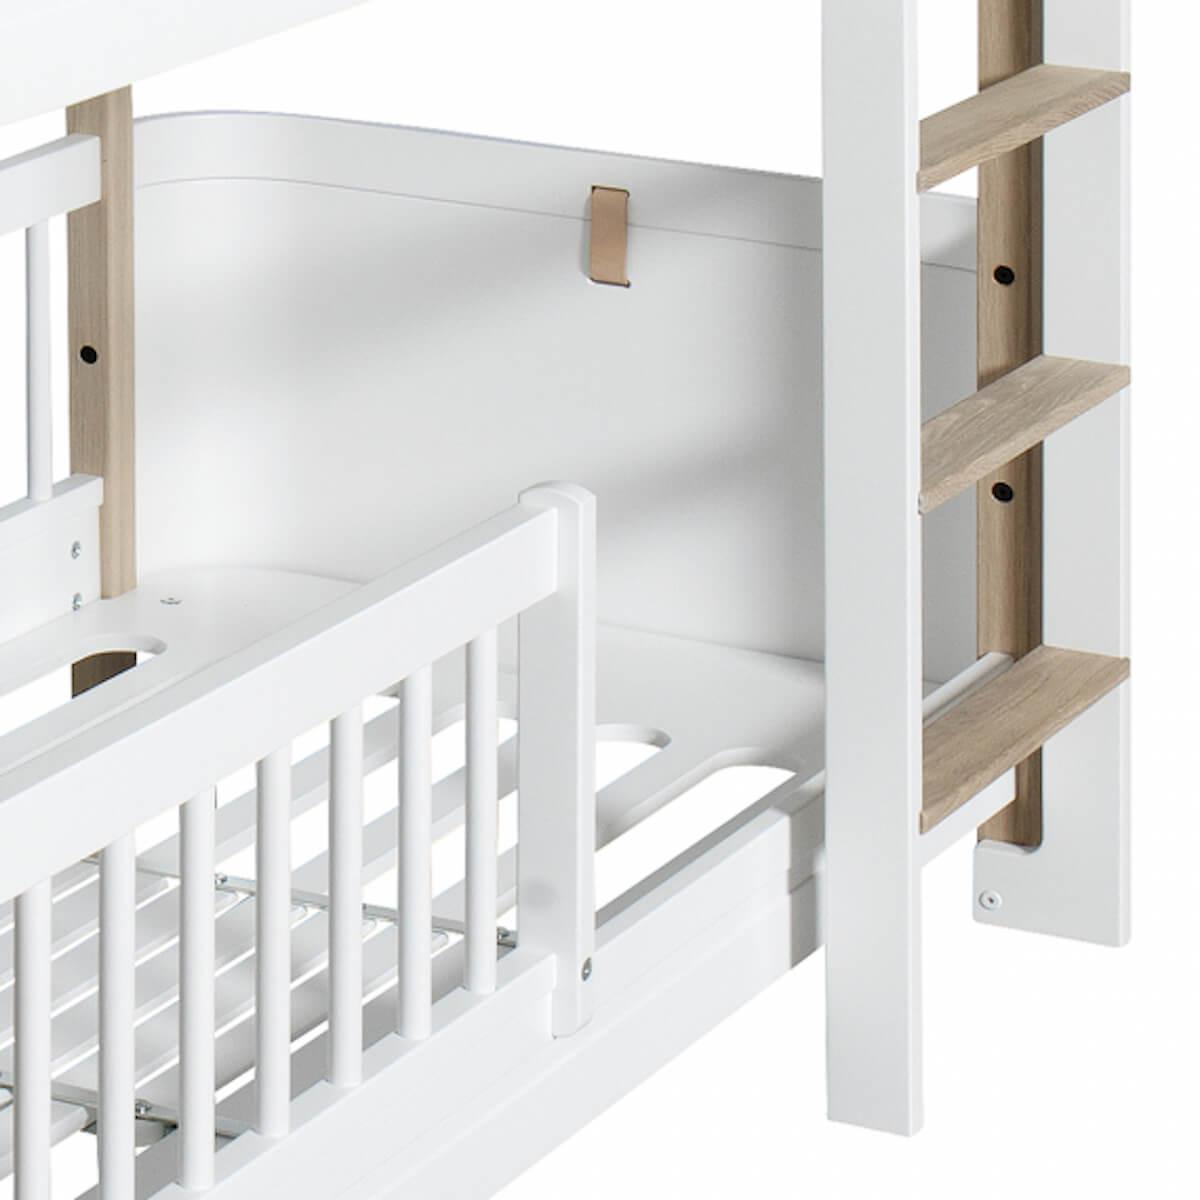 Lit superposées 68x162cm WOOD MINI+ Oliver Furniture chêne-blanc